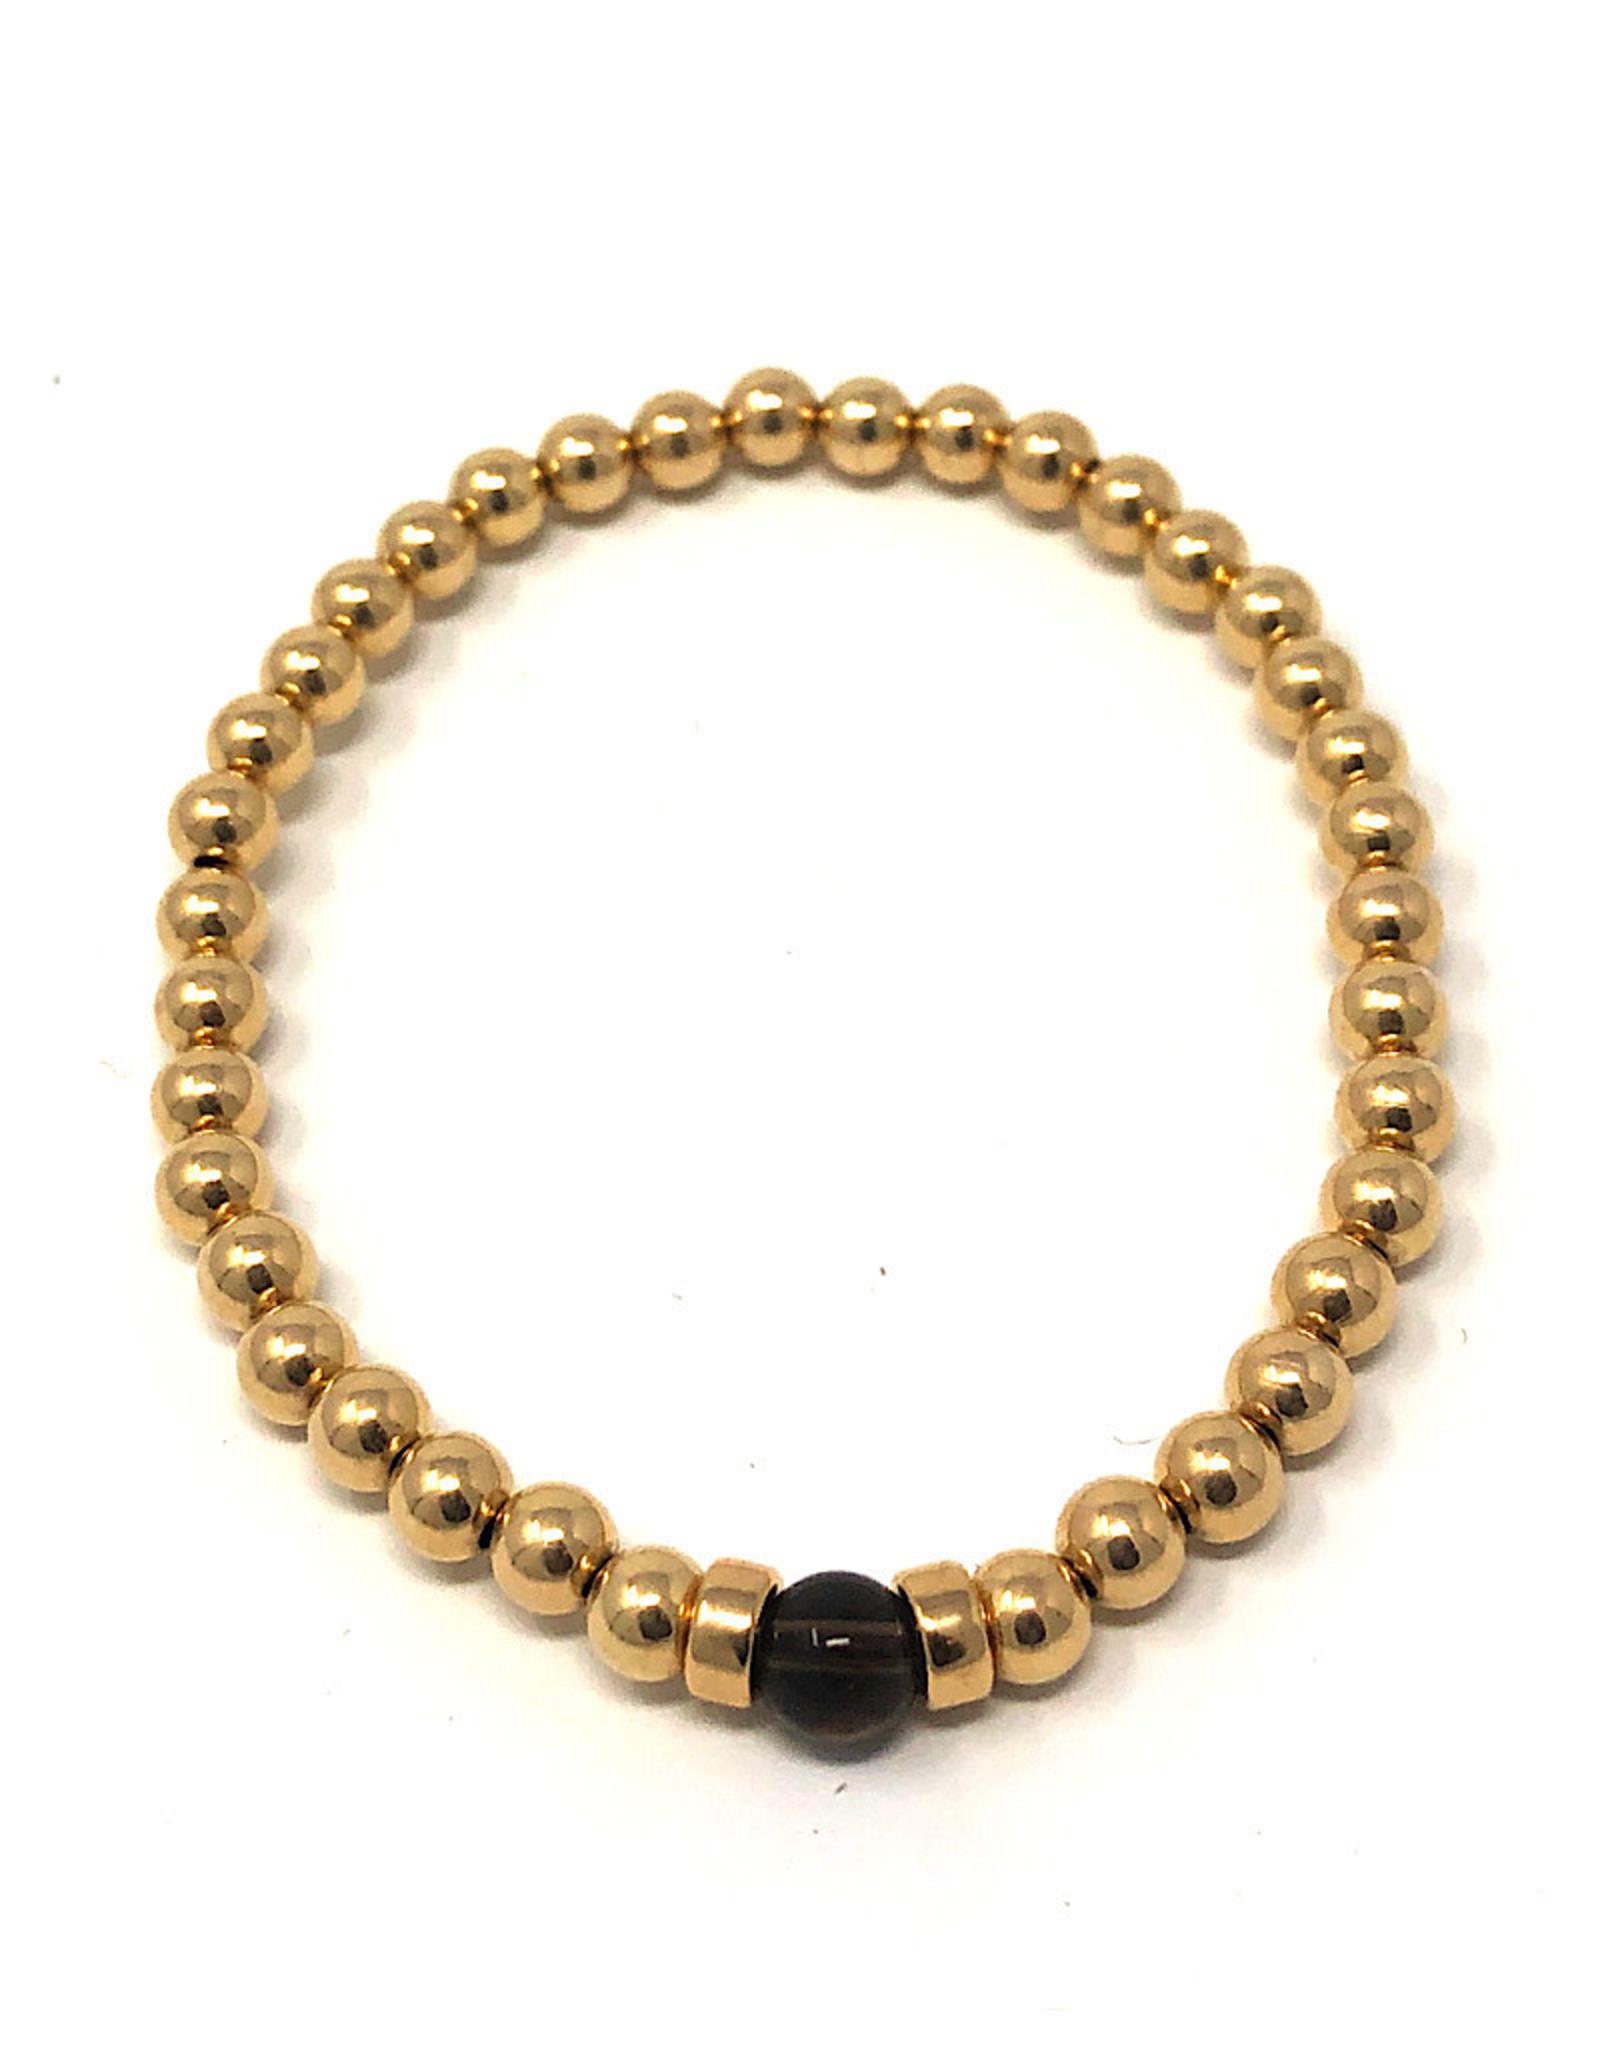 Beblue Gold Bracelet with black bead